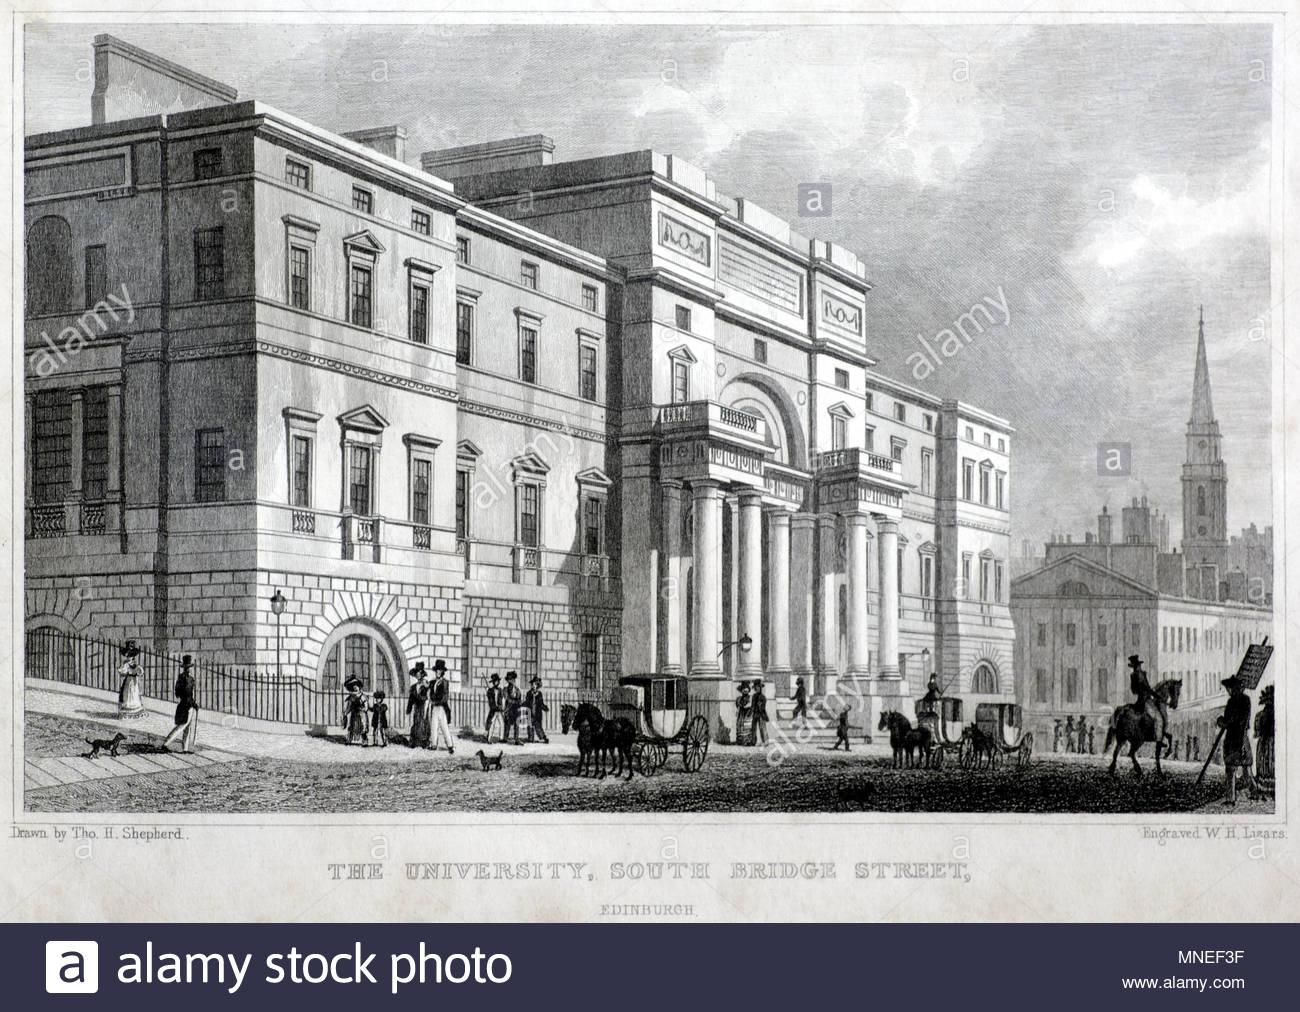 The University, South Bridge Street, Edinburgh, antique engraving from 1829 - Stock Image